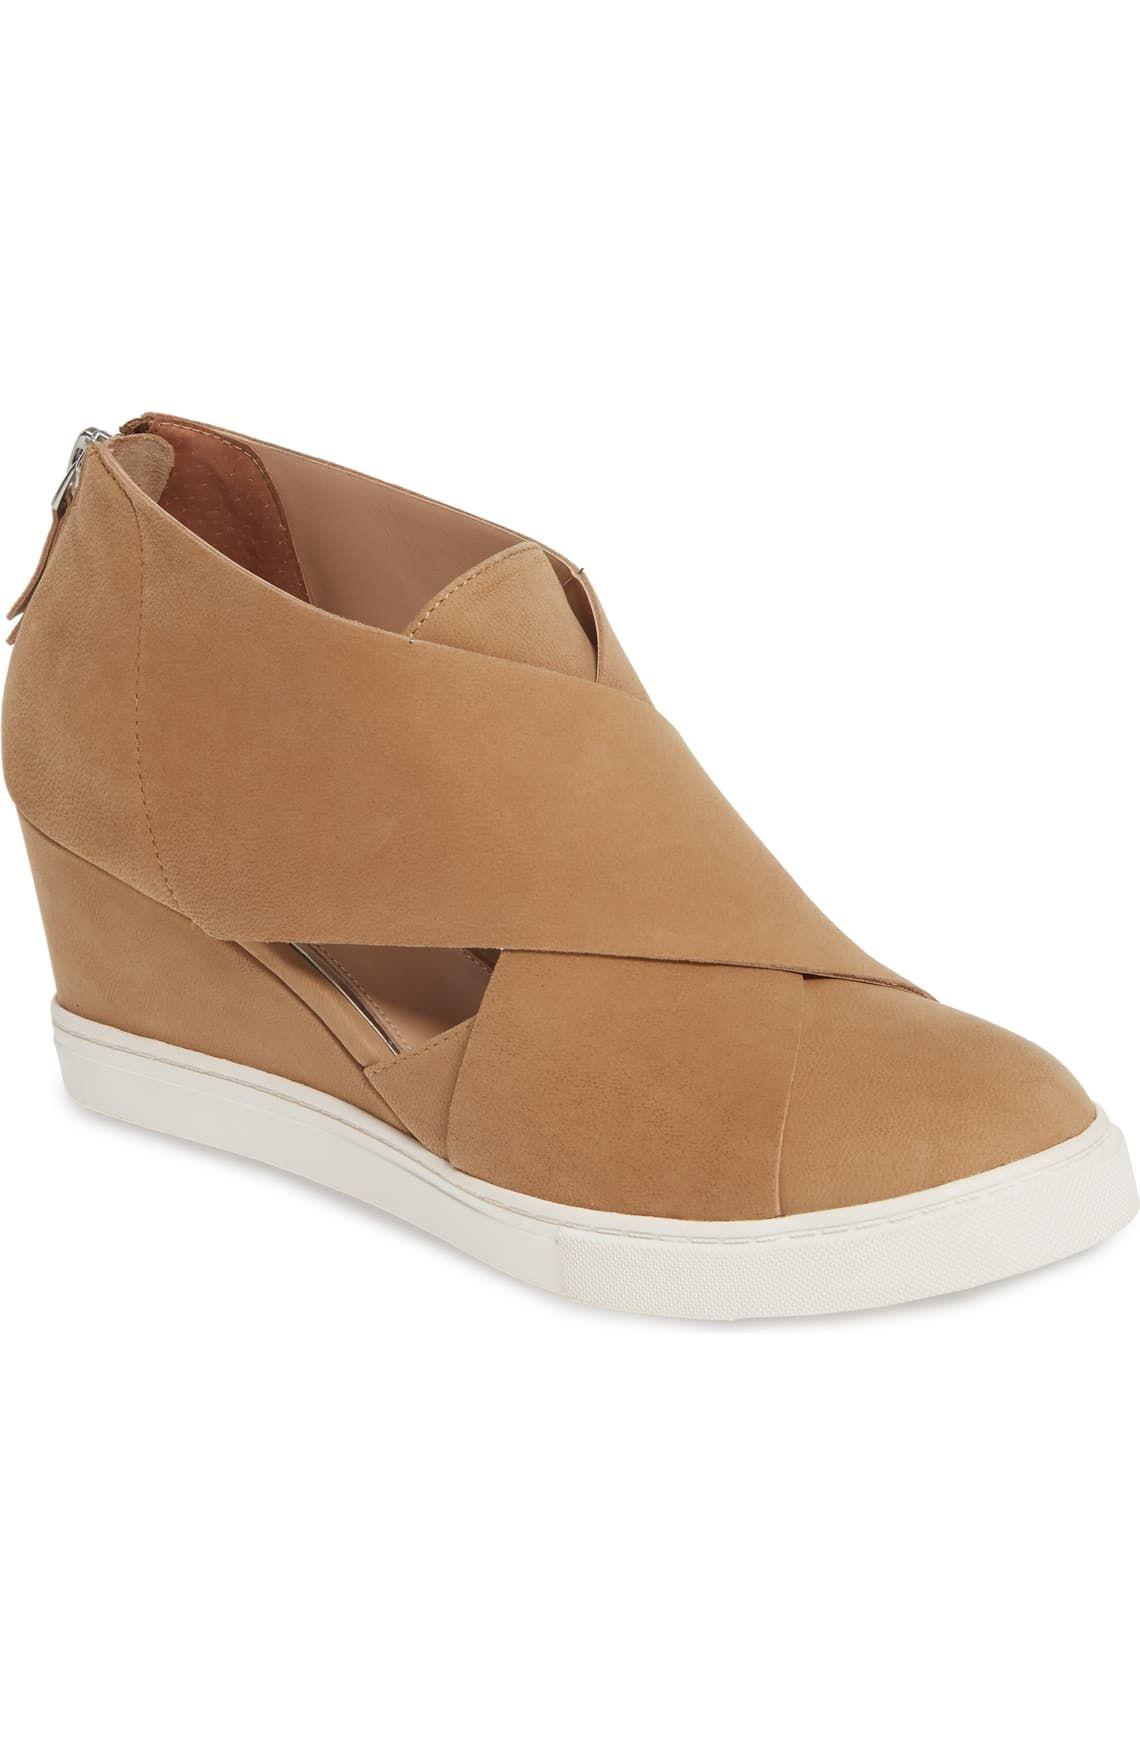 Linea Paolo Faith Wedge Sneaker (Women